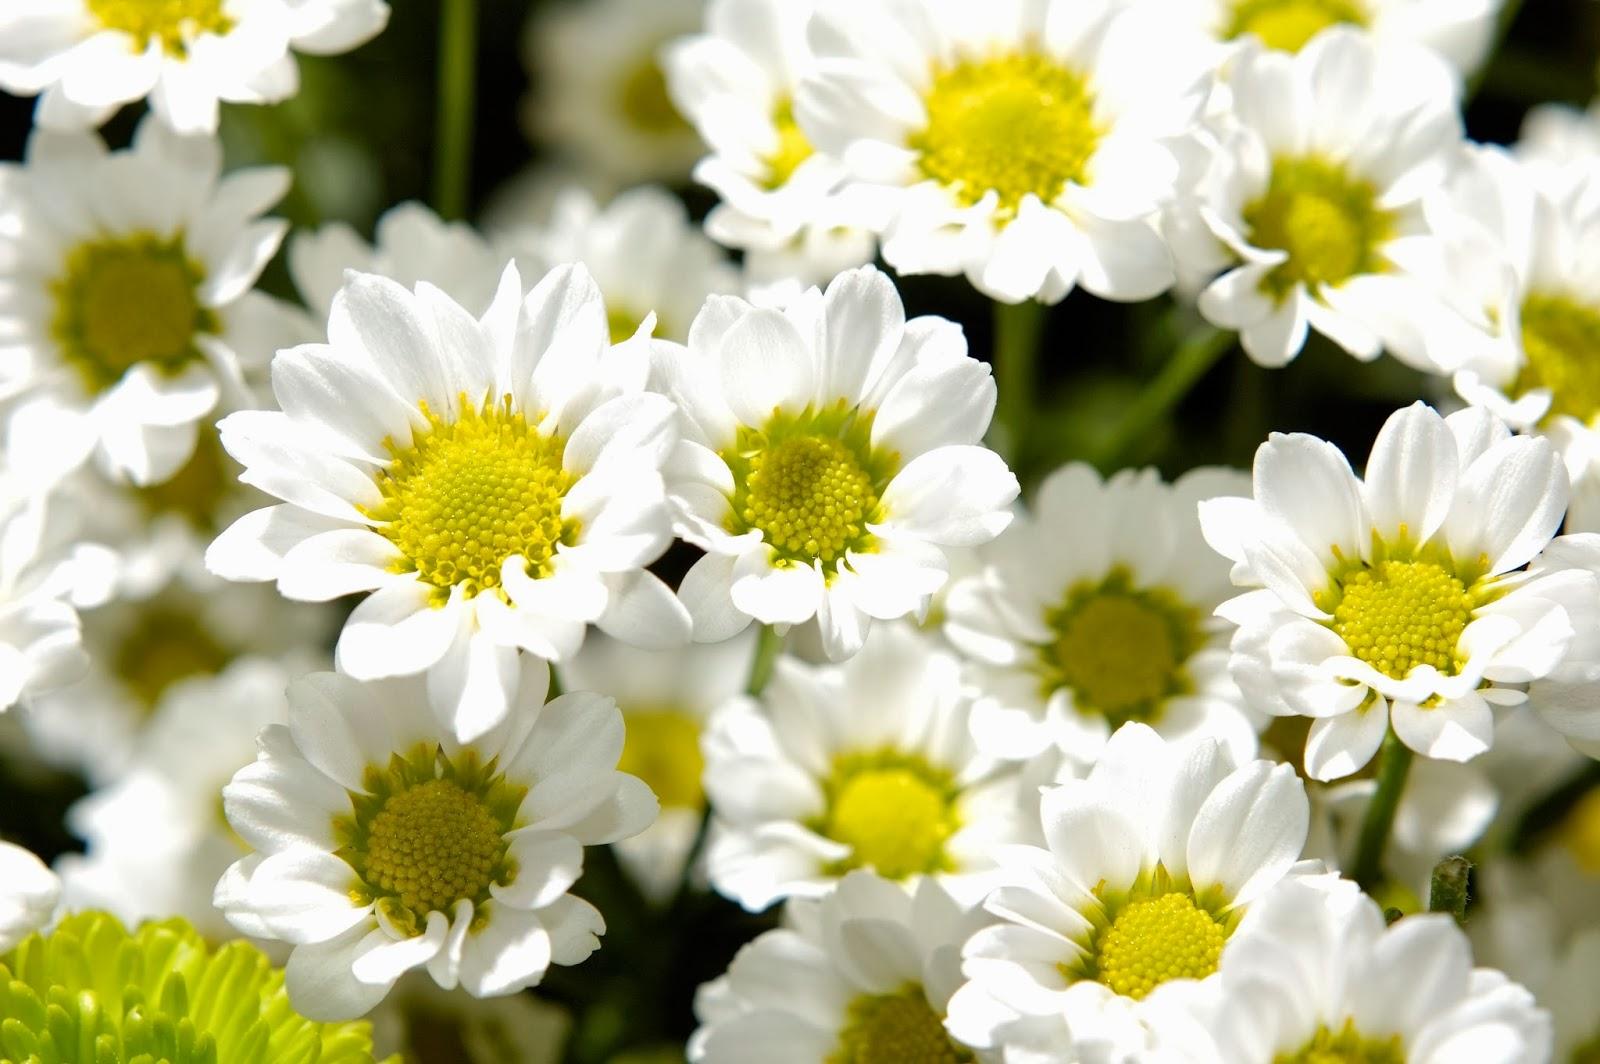 Jasmine flowers hd wallpapers download top hd wallpapers share this post izmirmasajfo